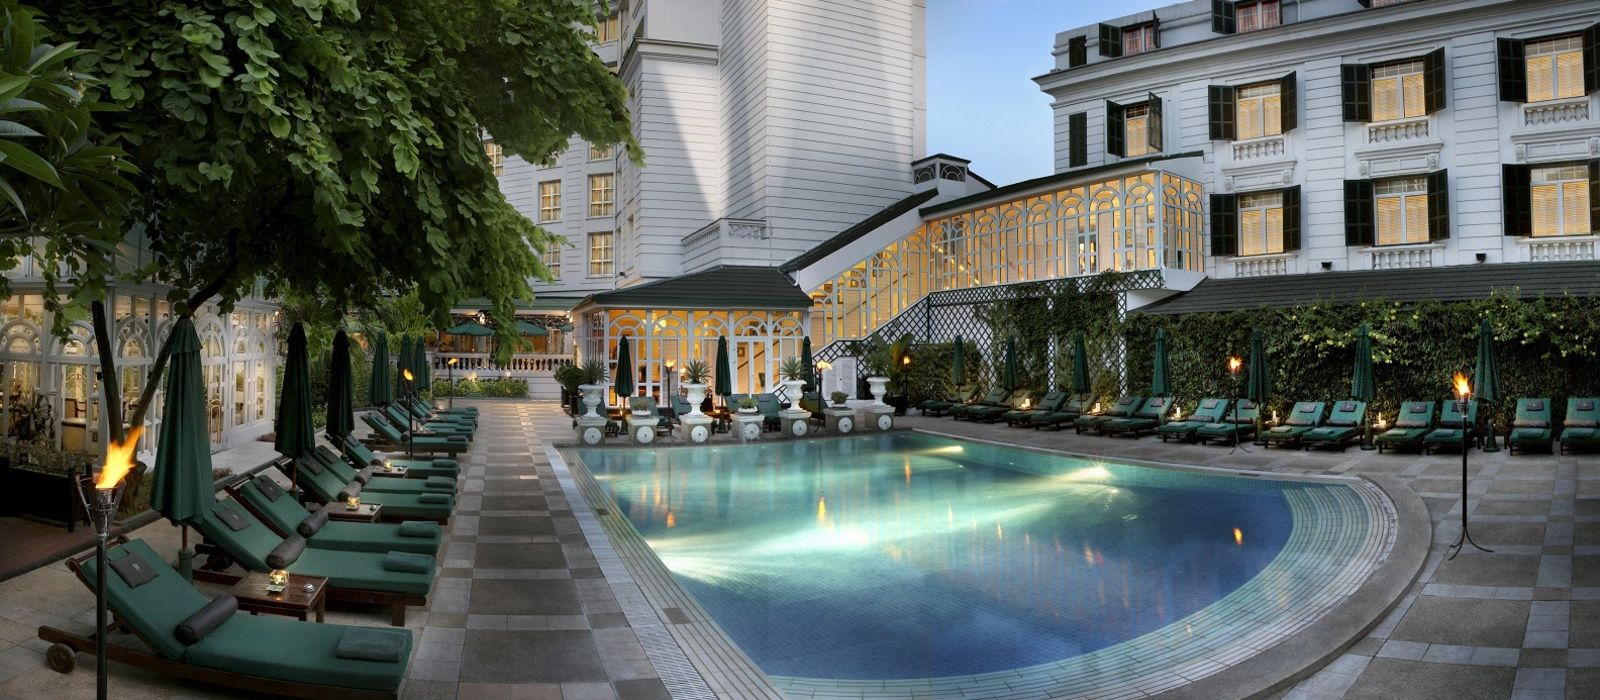 Hotel Sofitel Legend Metropol (Hanoi) Vietnam